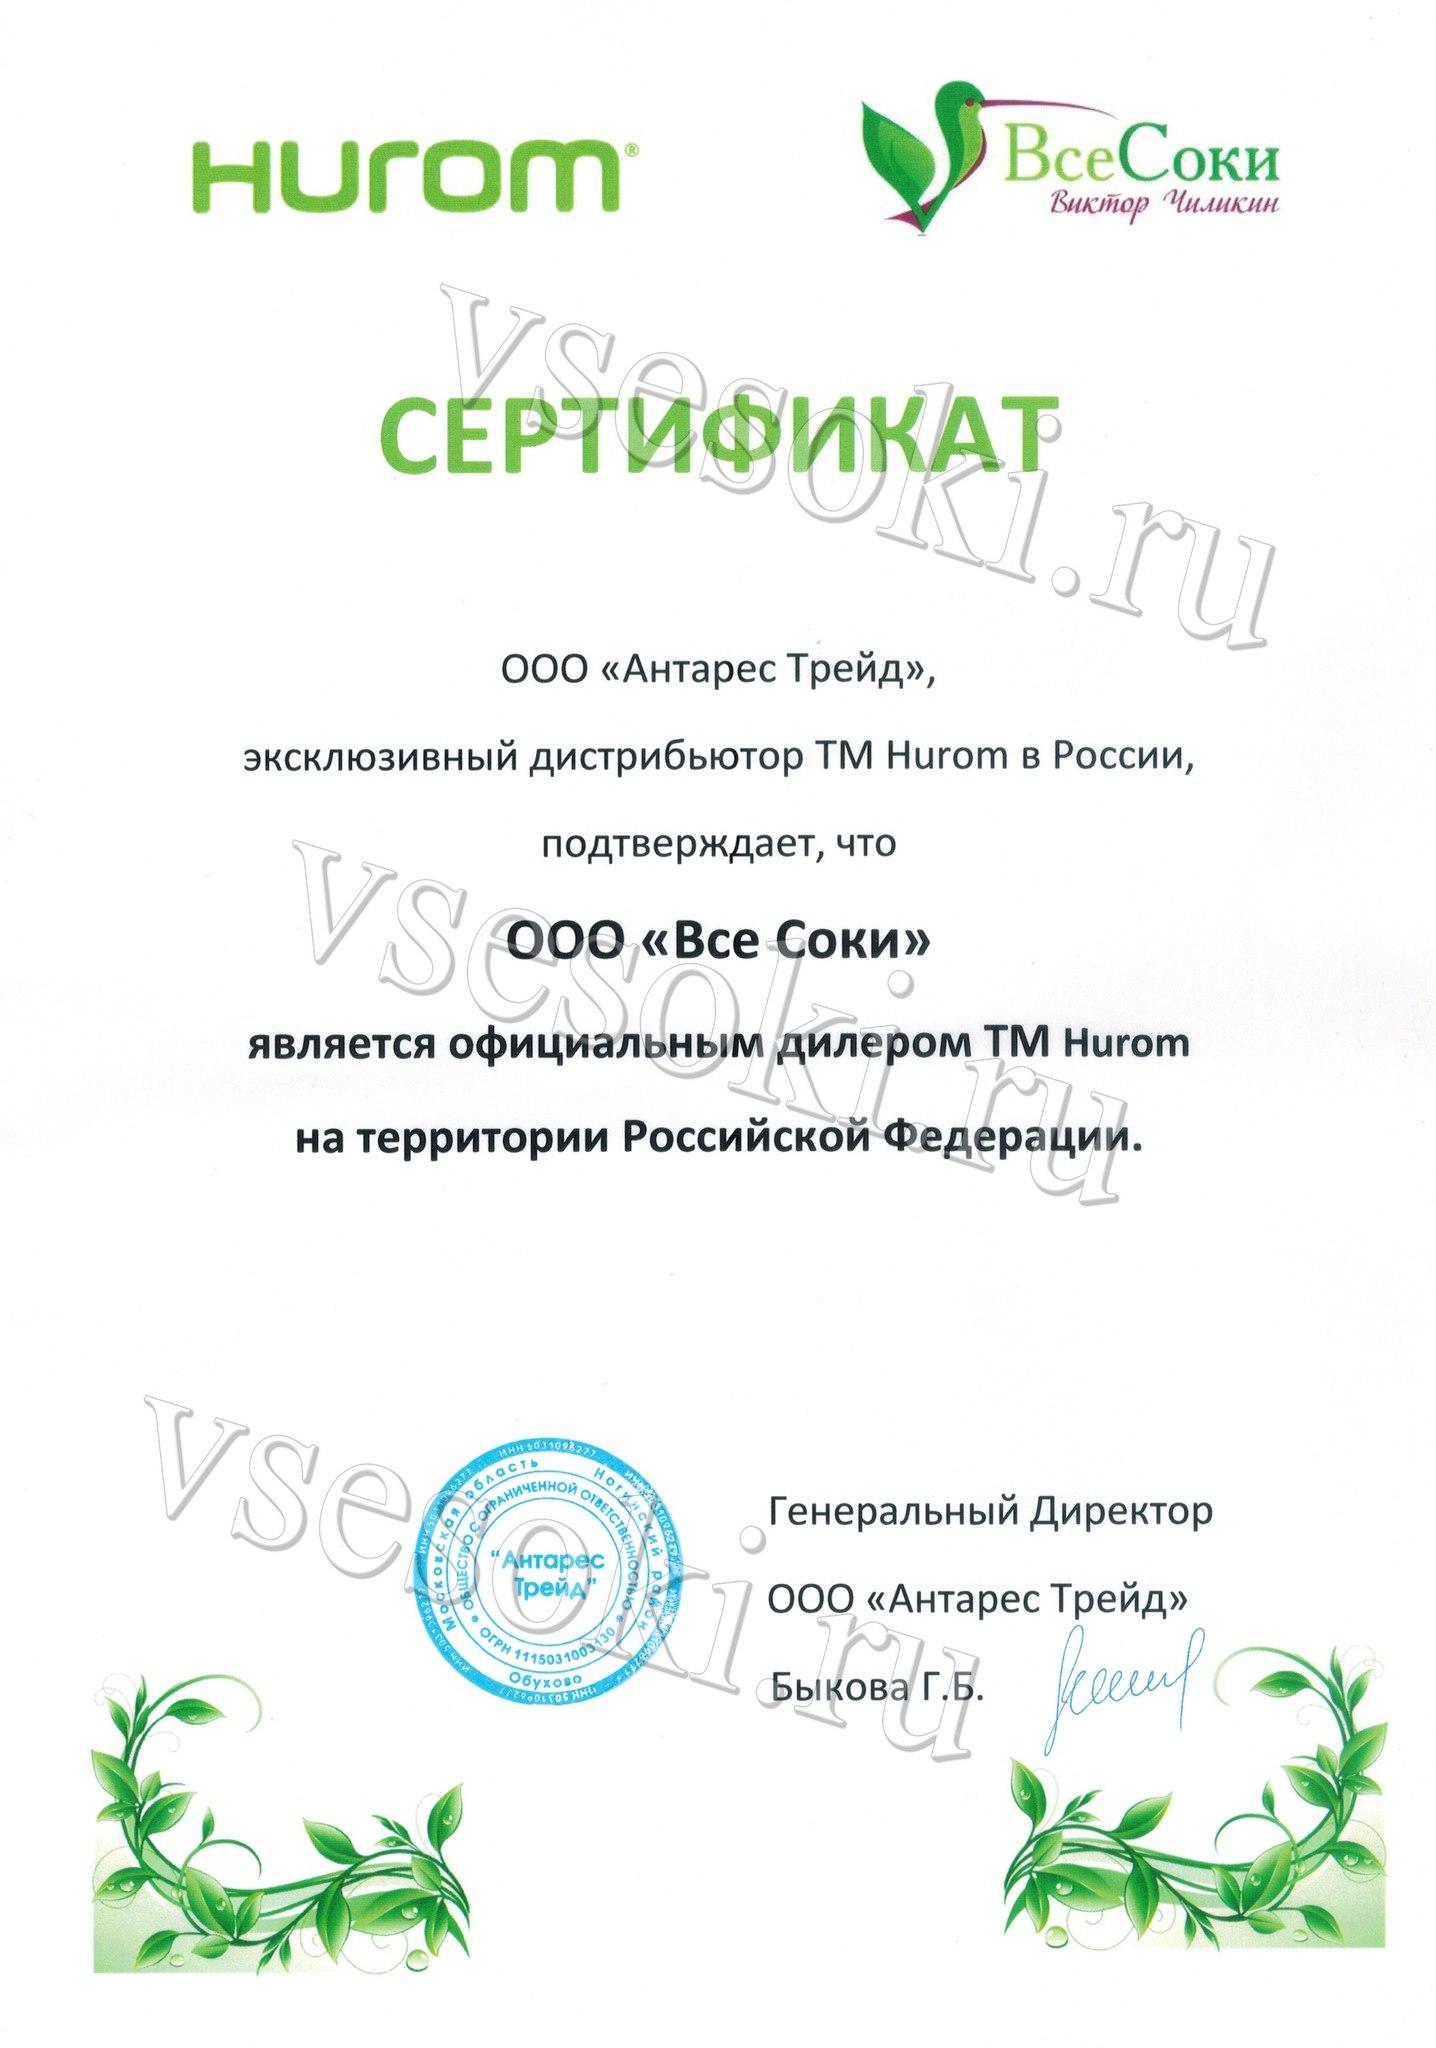 сертификат_Хюром.jpg